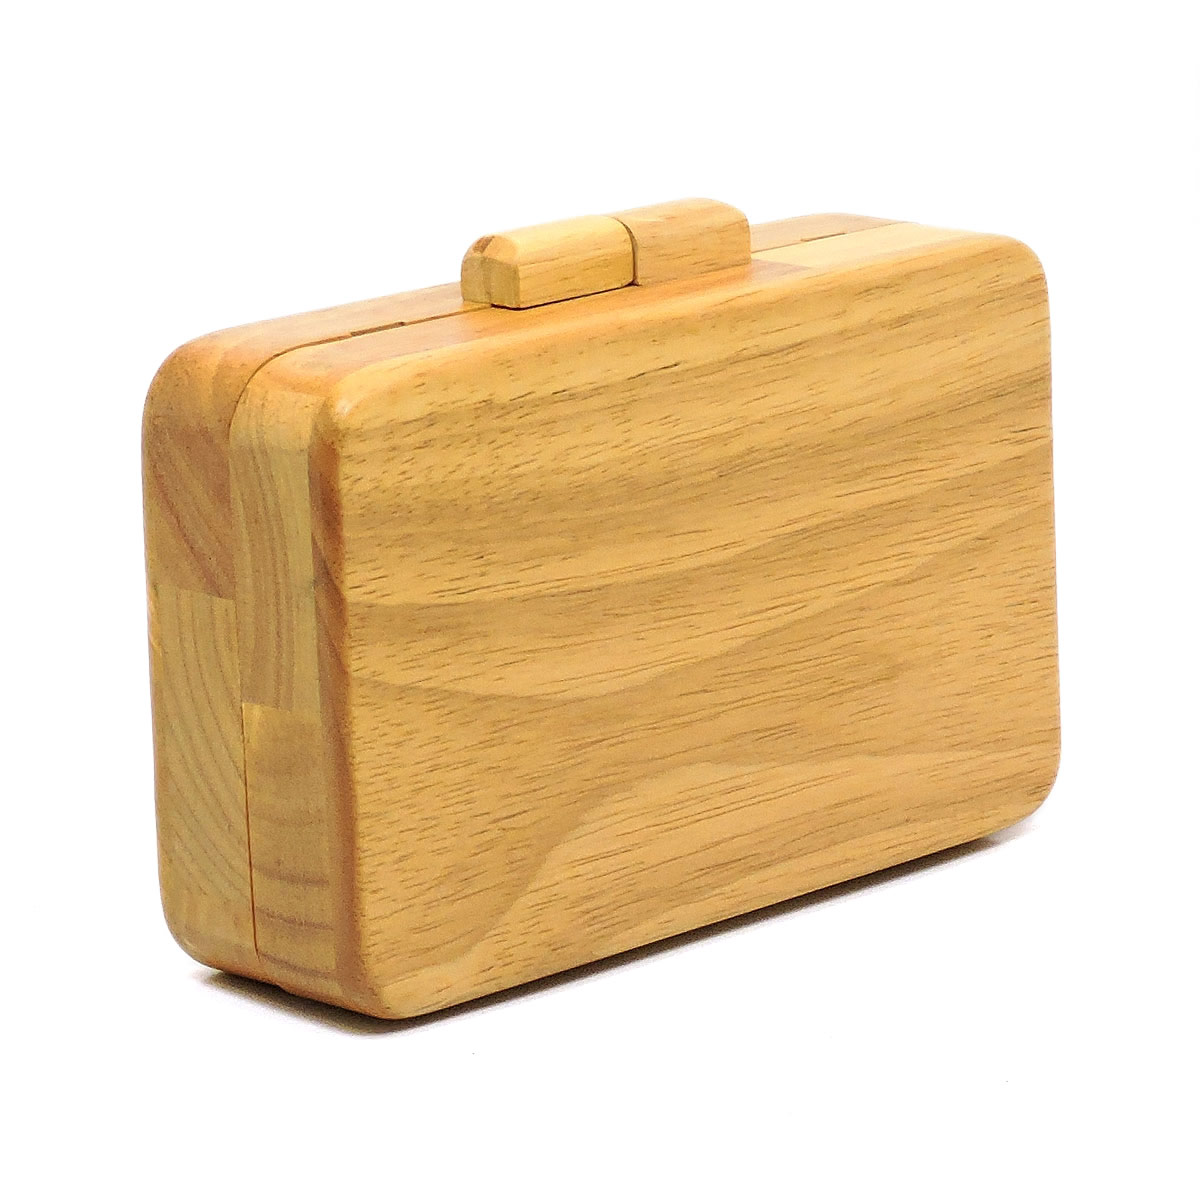 Wooden Box Clutch Purse Shoulder Bag - orangeshine.com